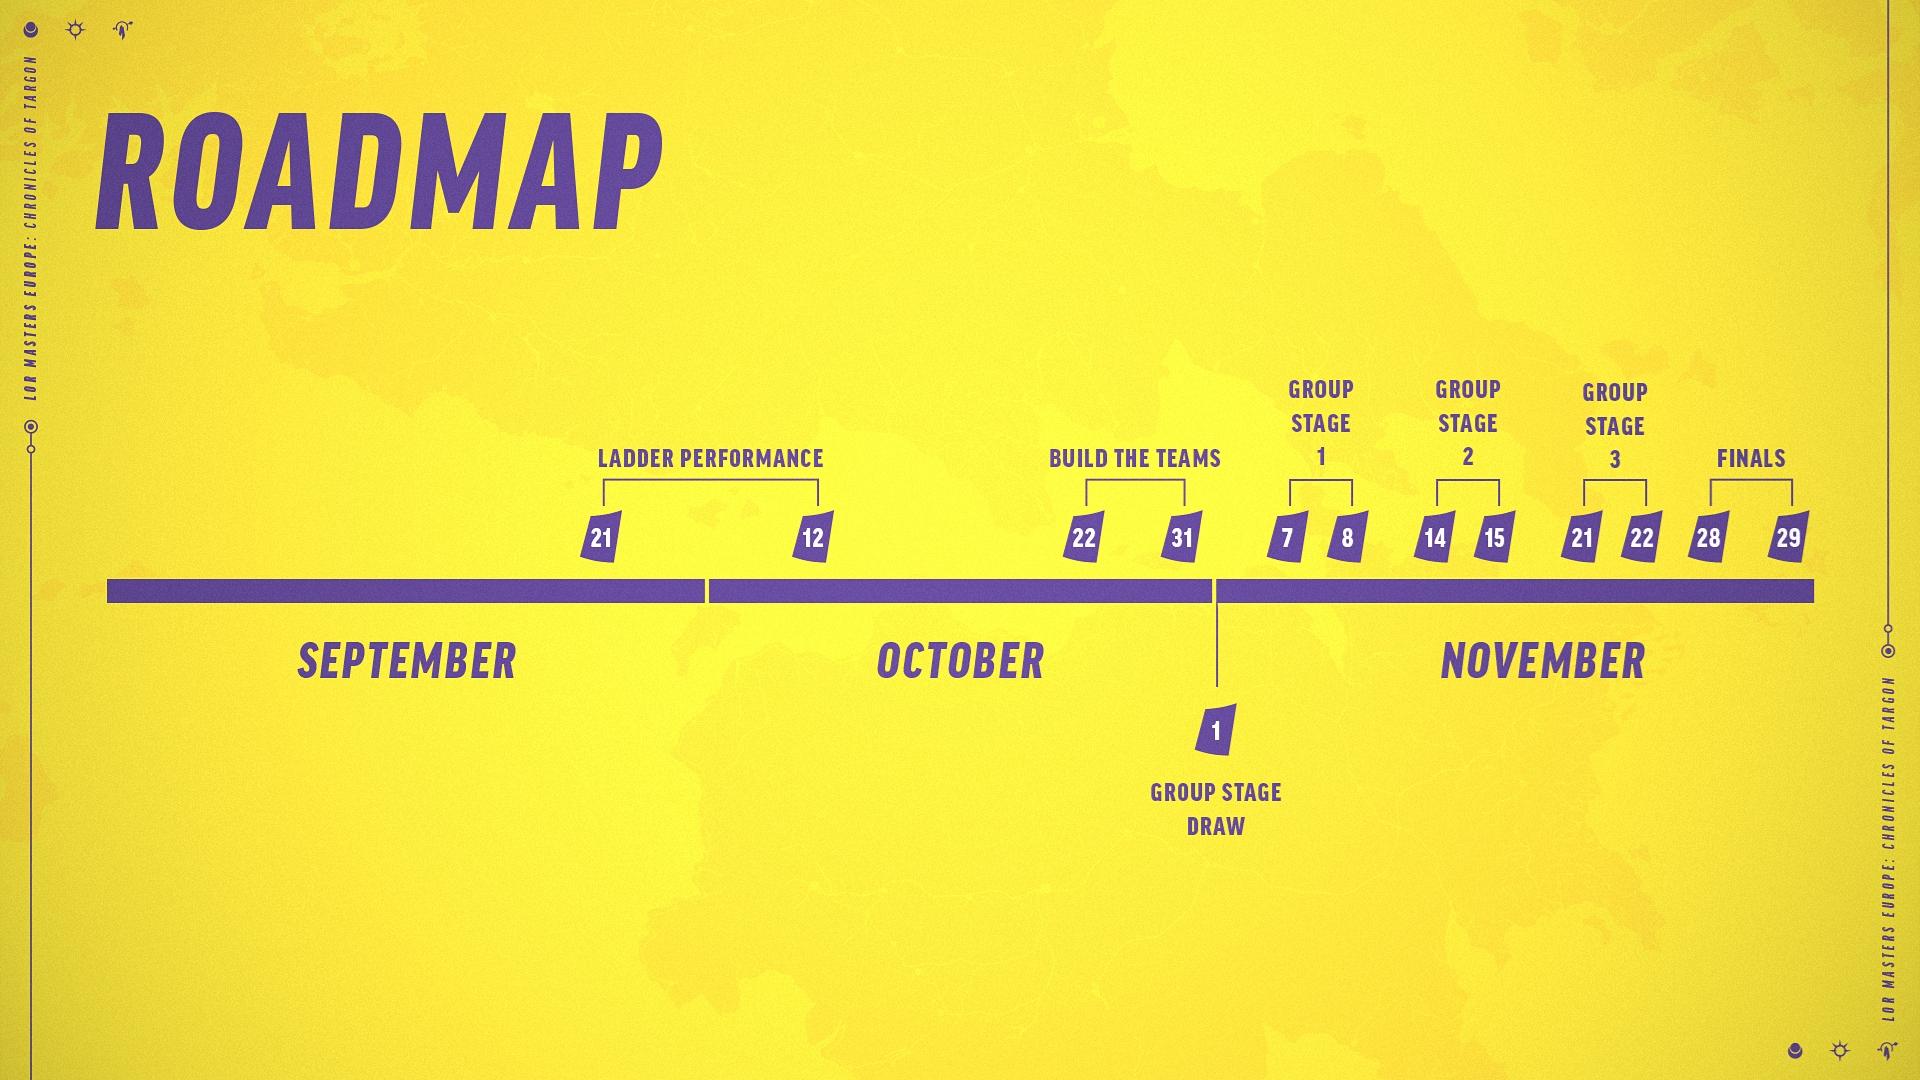 LoR_Masters_Europe_-_Article_Roadmap.jpg